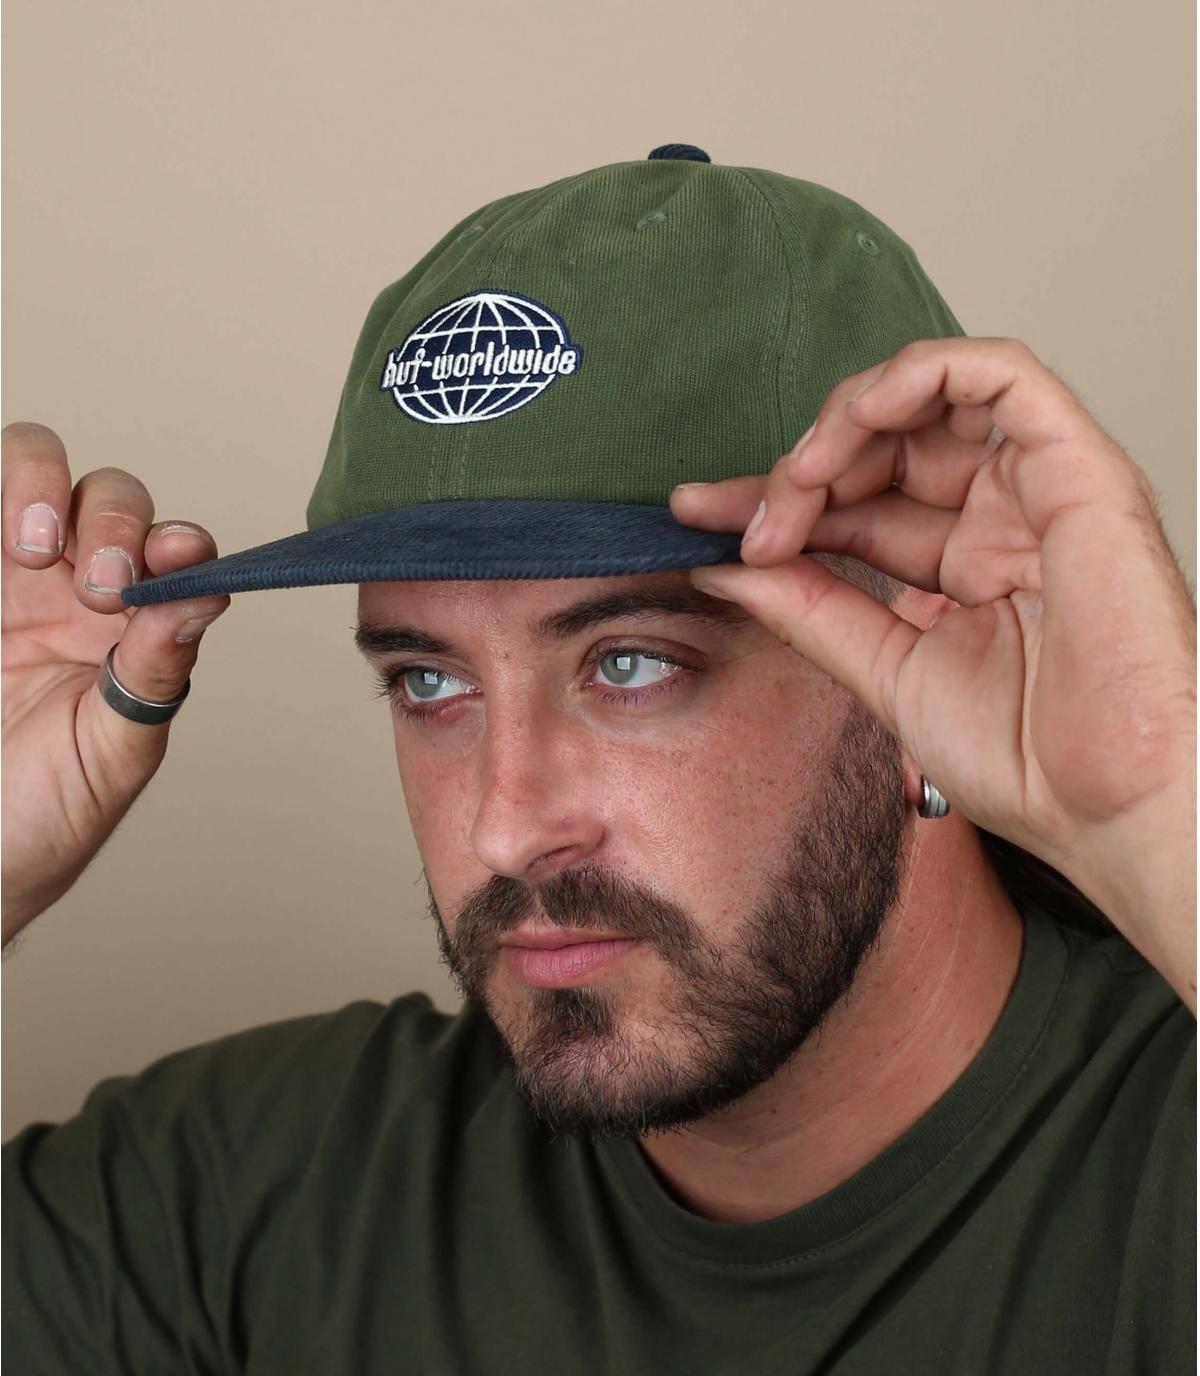 casquette velours Huf